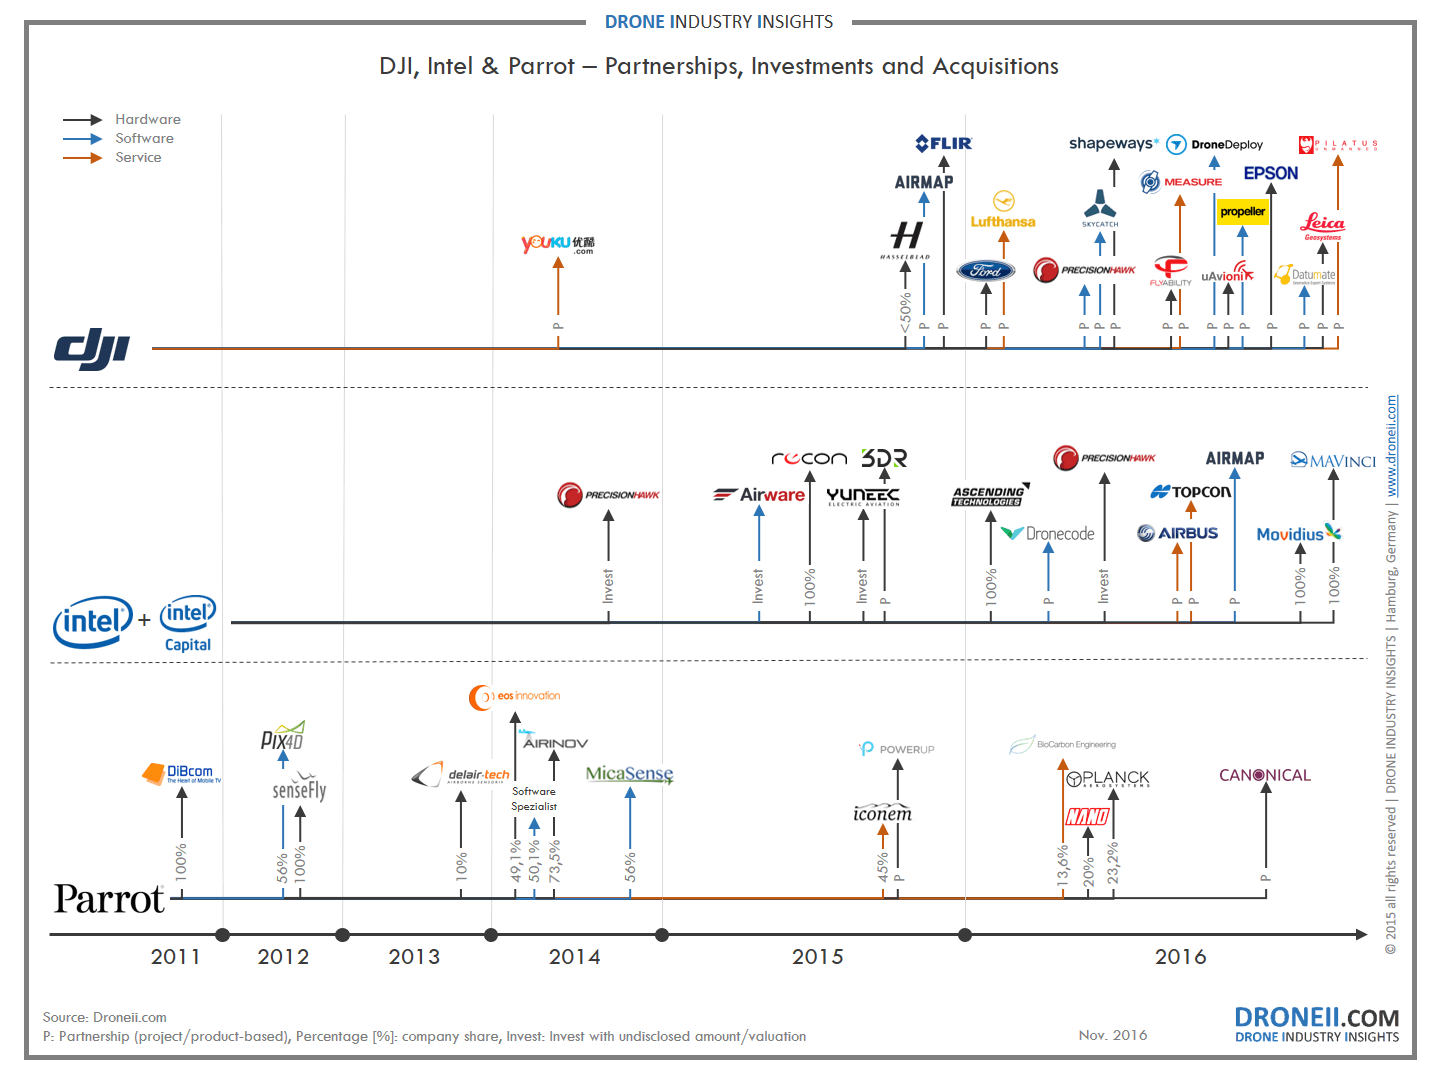 DJI Parrot Intel estrategias mercado drones